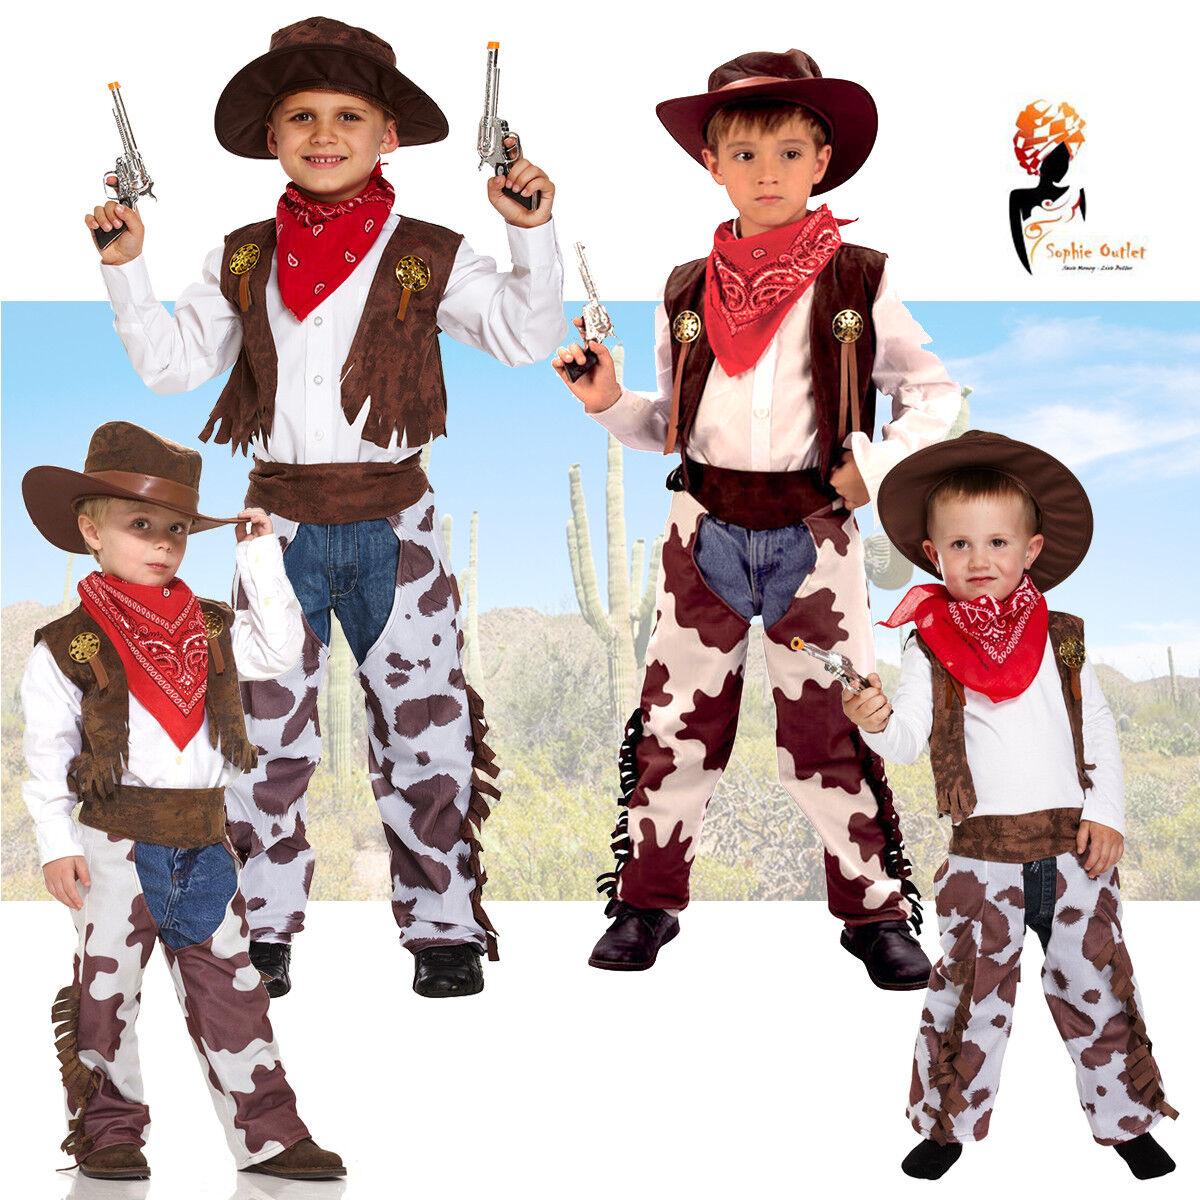 Boys Childrens Kids Book Week Cowboy Costume Fancy Dress Outfit Party Wear